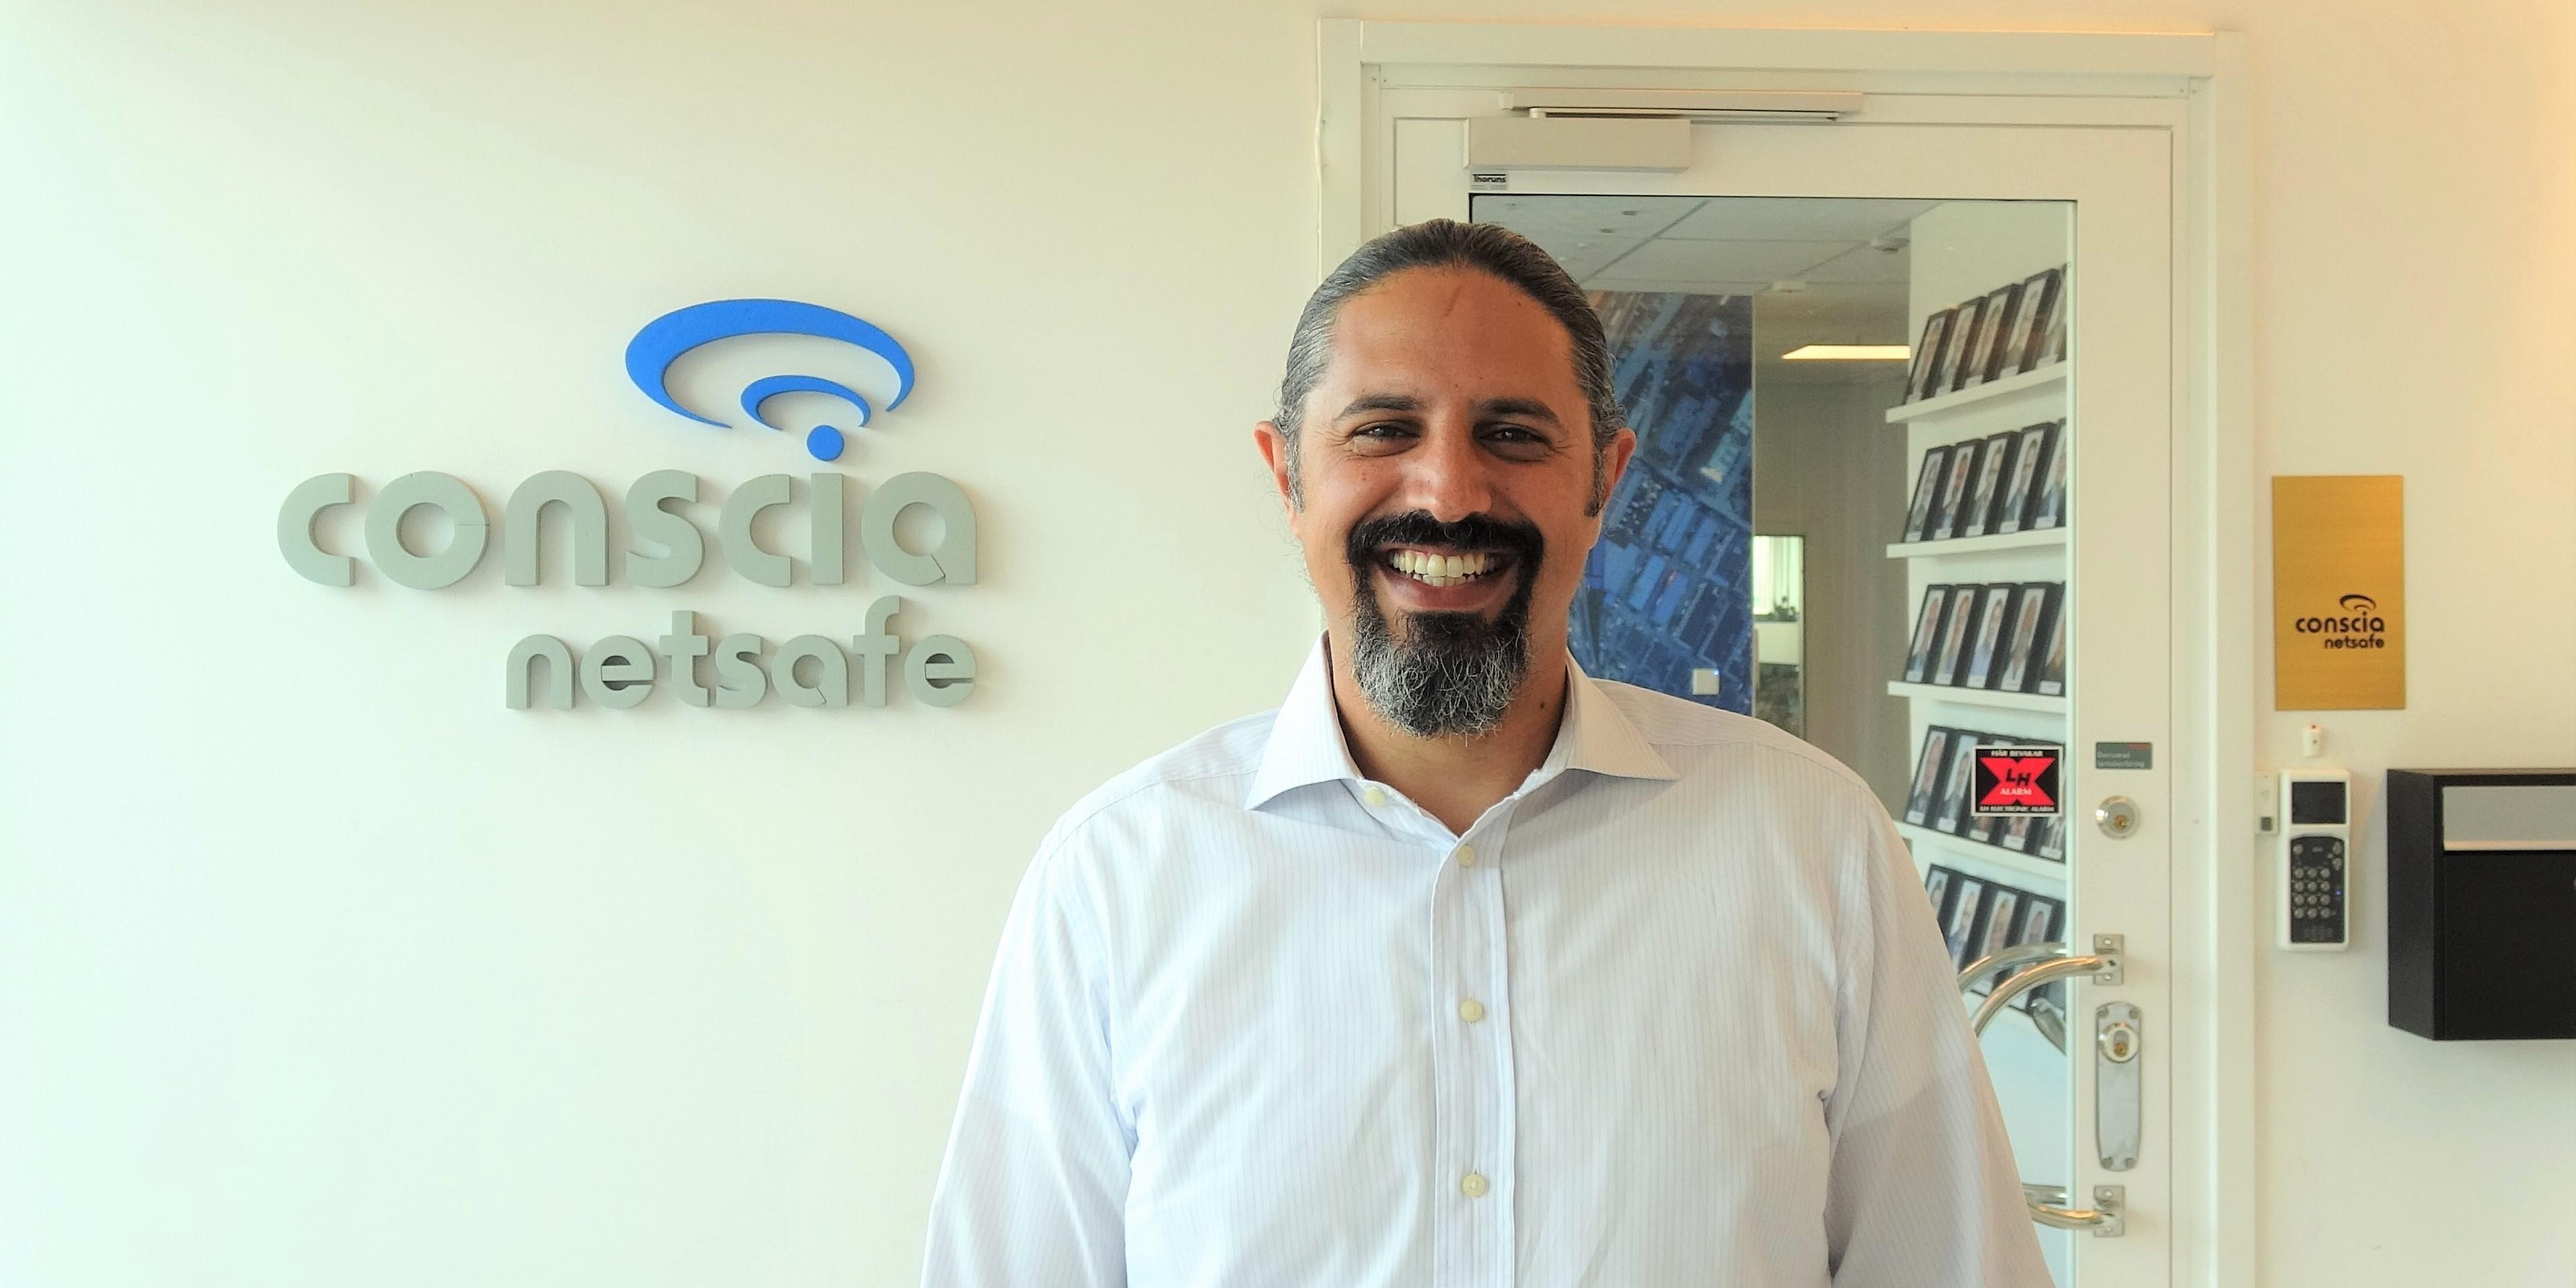 Yassir Ibrahim CCIE Conscia Netsafe Tele2